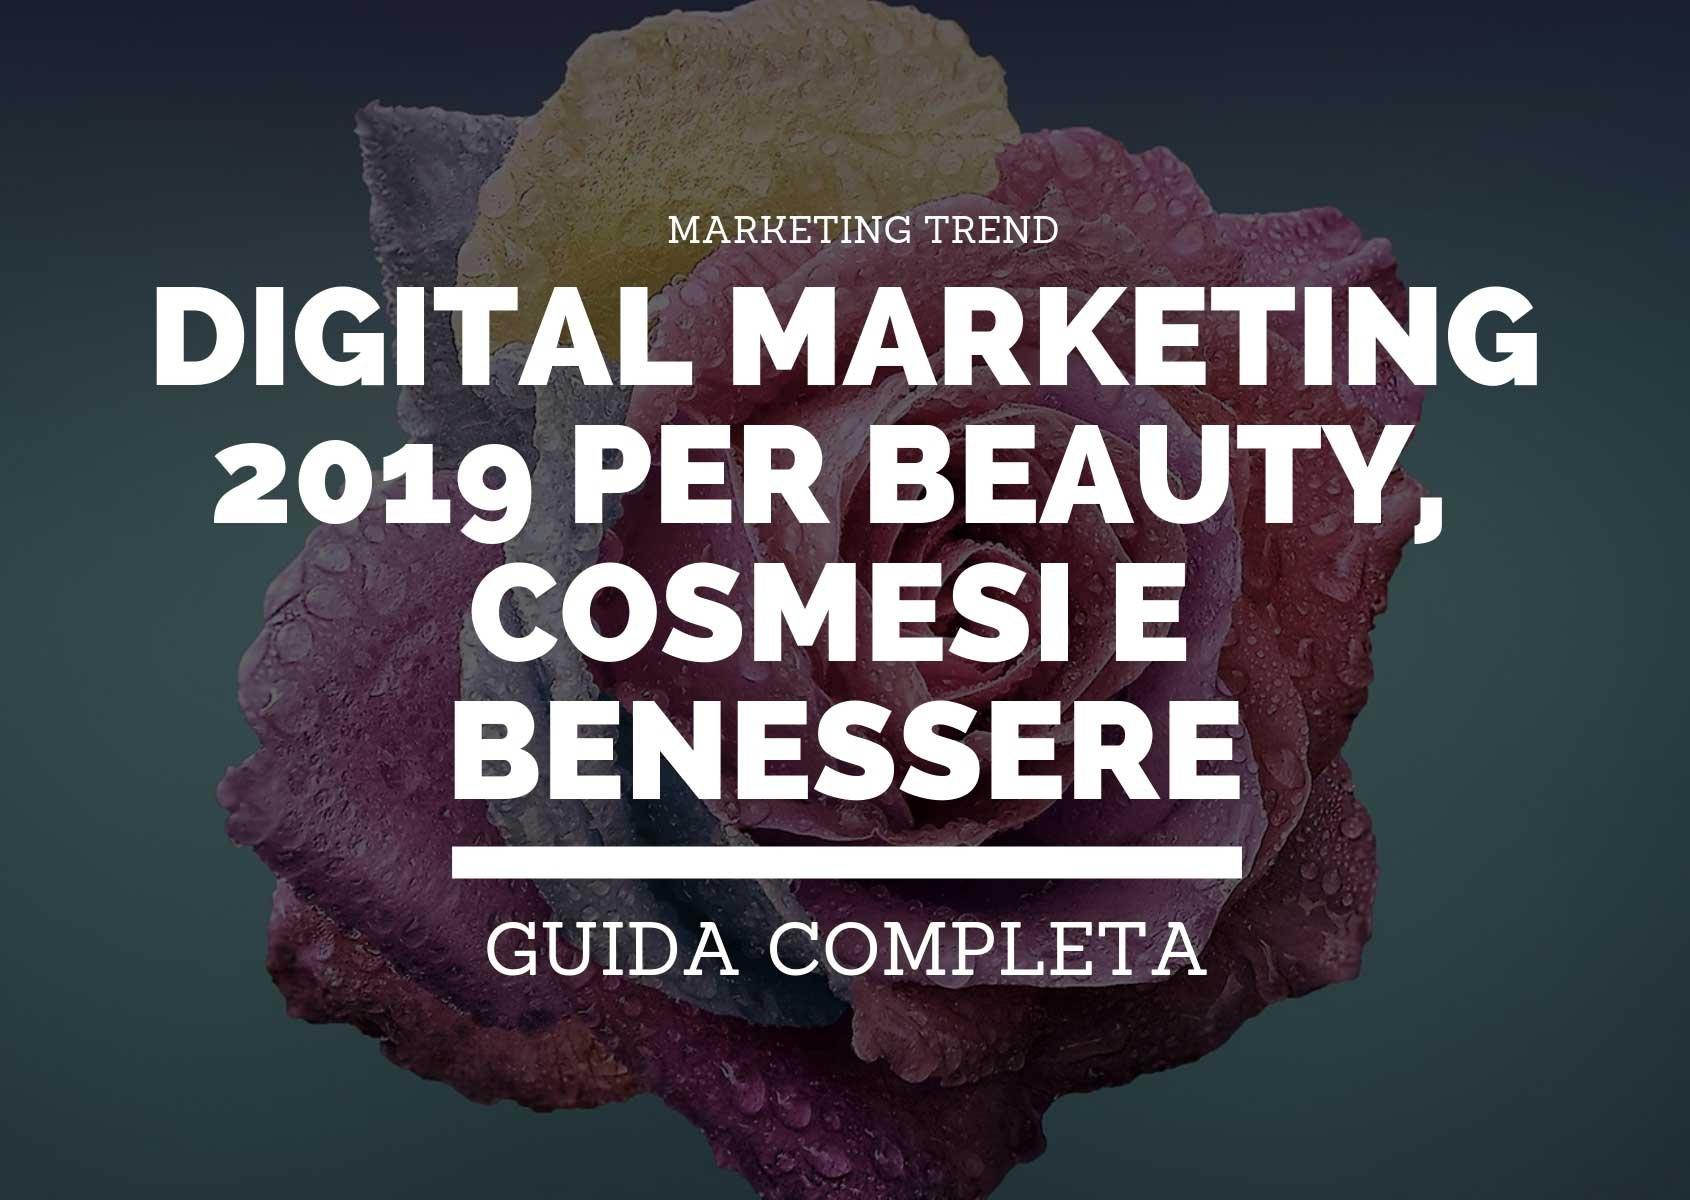 Digital marketing 2019 per beauty, cosmesi e benessere